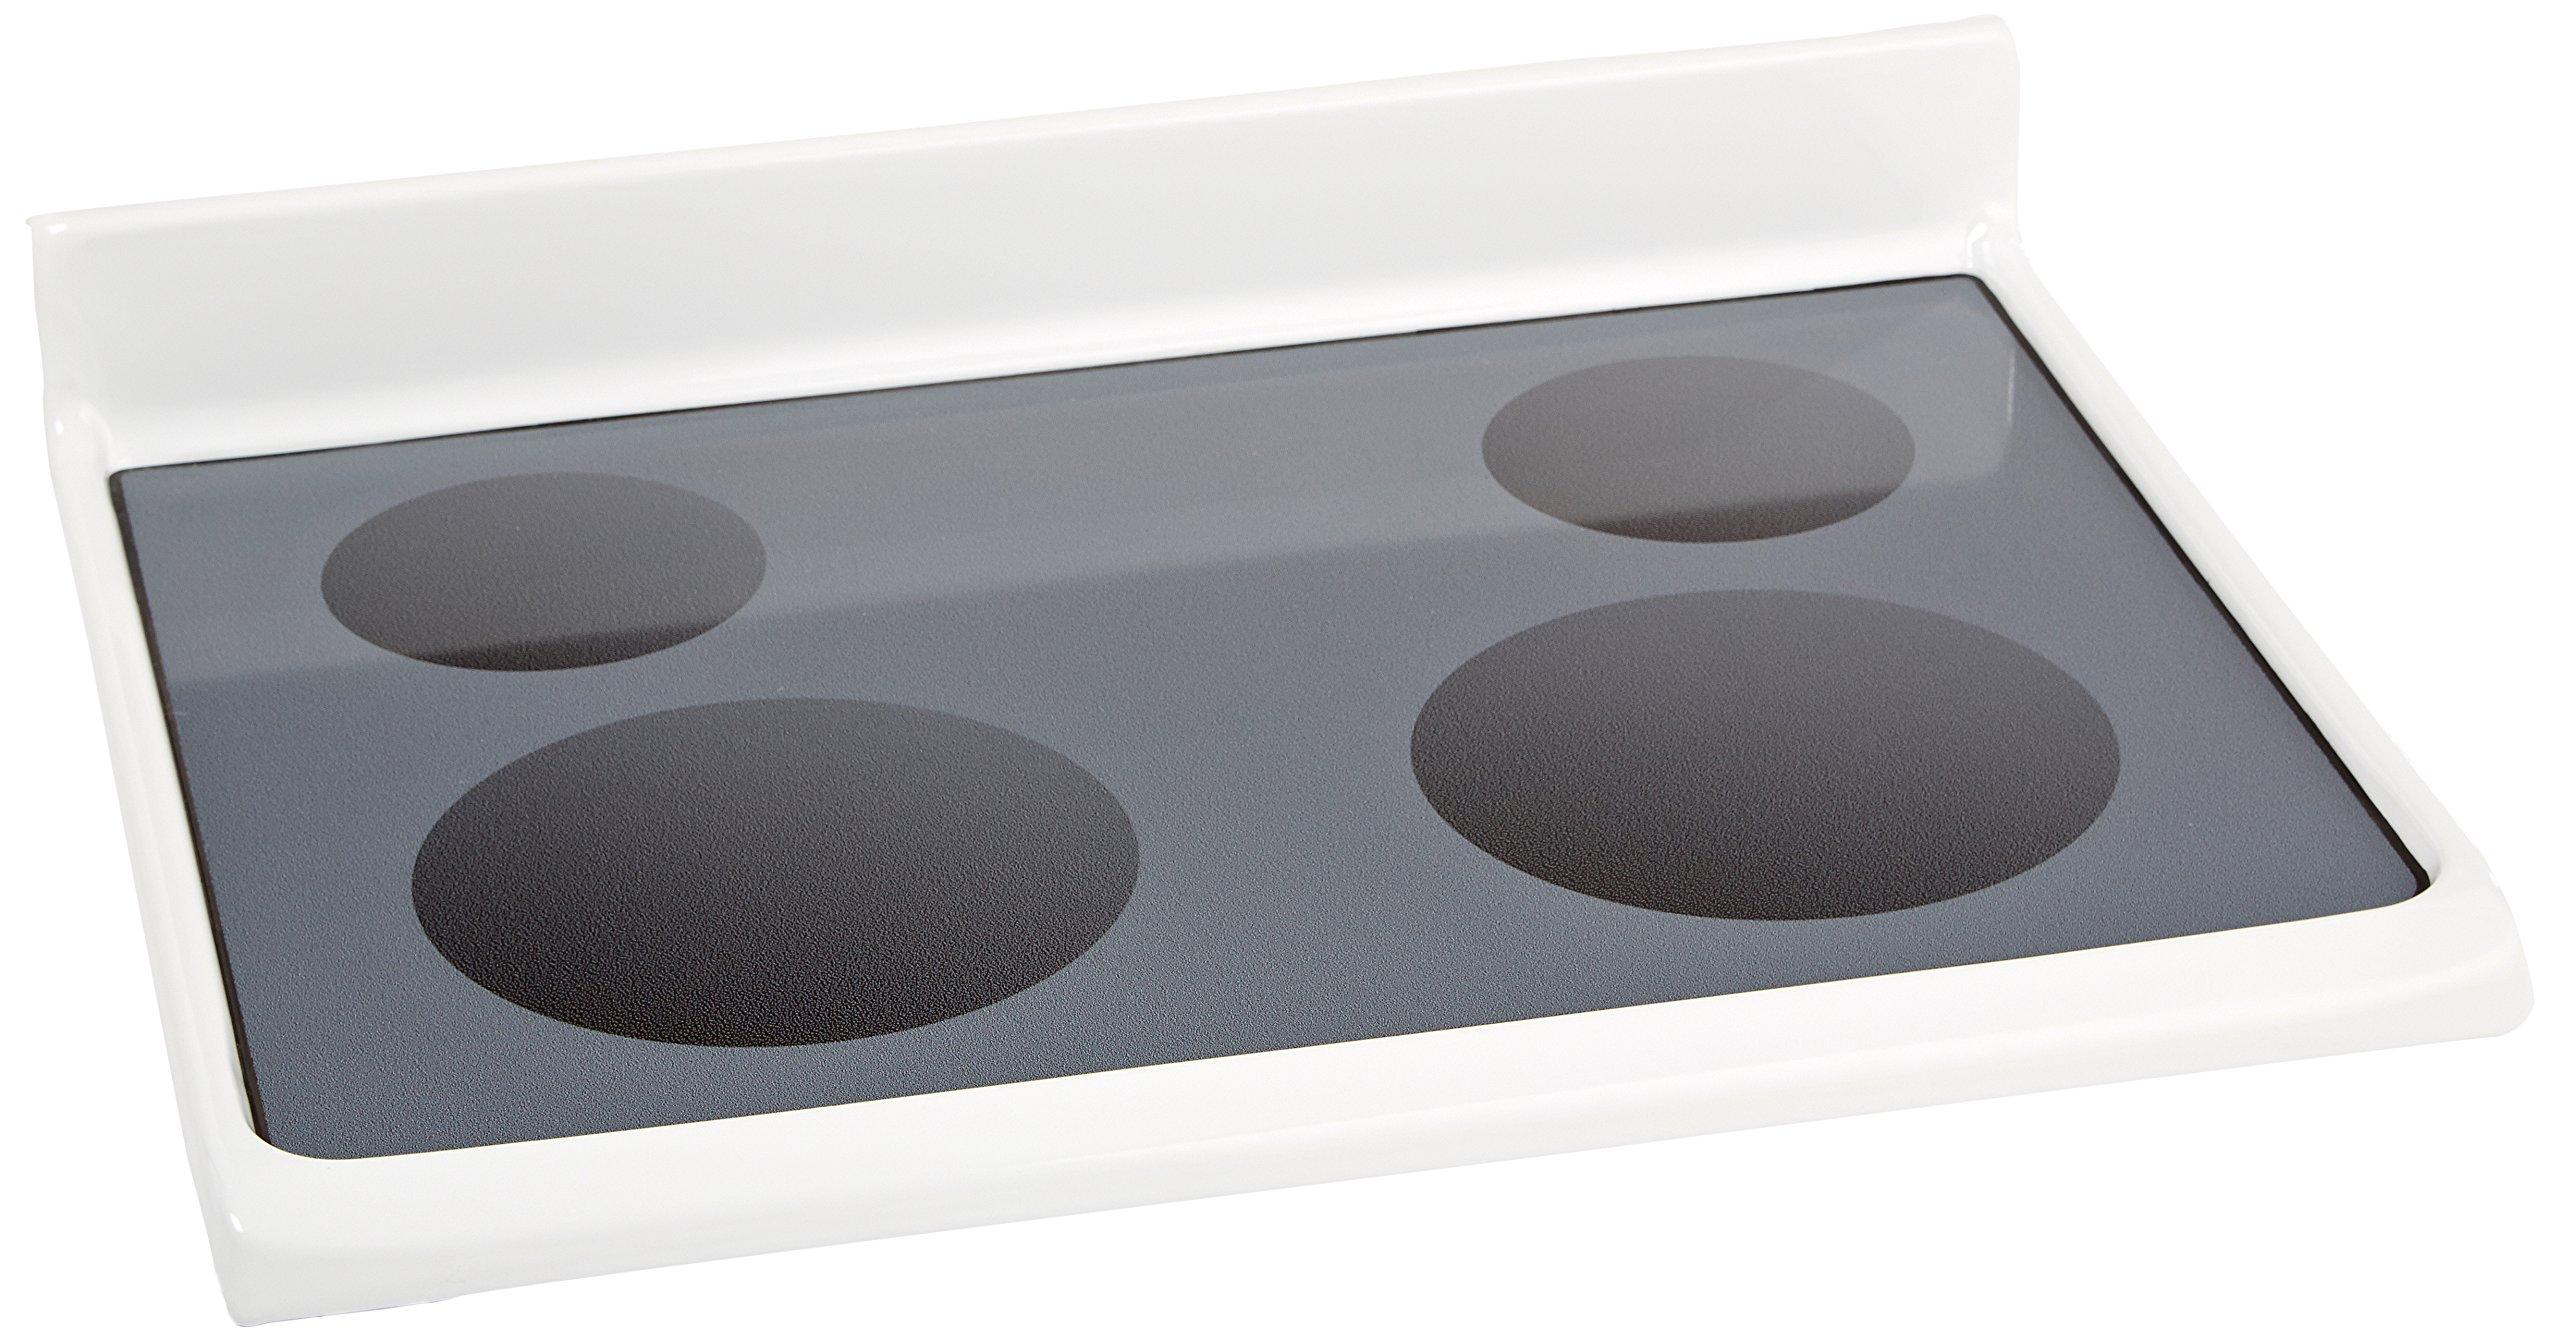 Frigidaire 316456236 Range/Stove/Oven Glass Cooktop